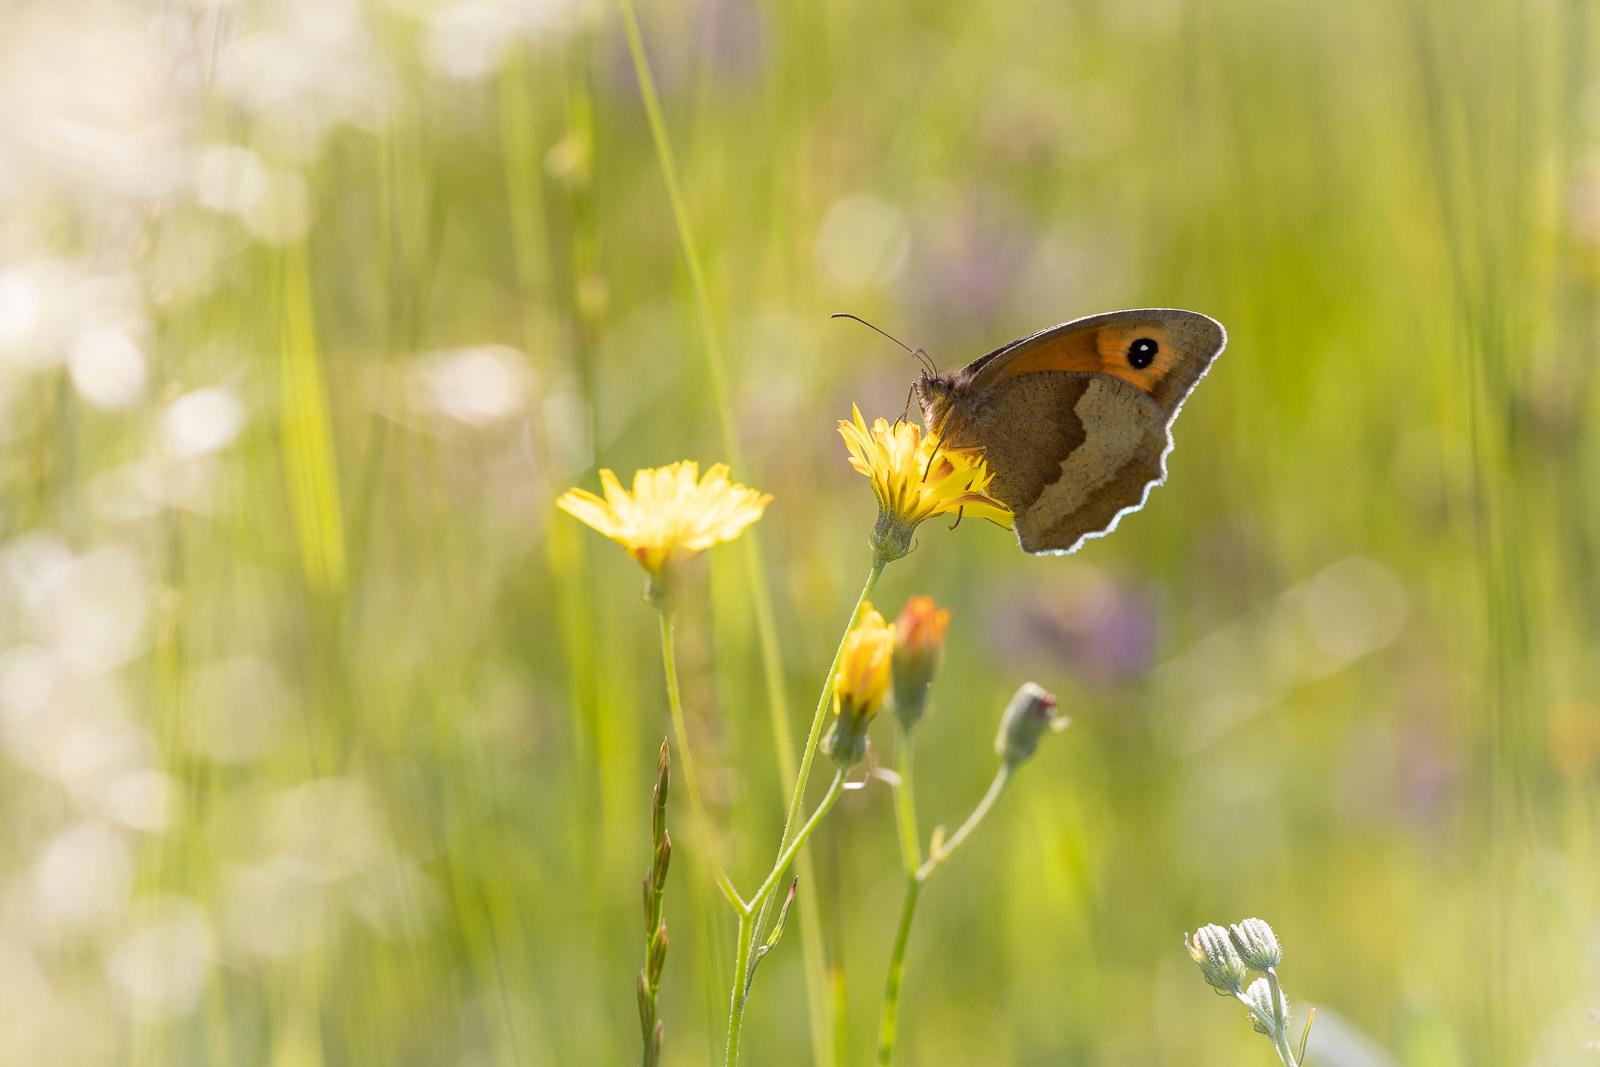 Meadow Brown (Maniola jurtina) - Collard Hill, Nr Street, Somerset, UK. ID BR59223